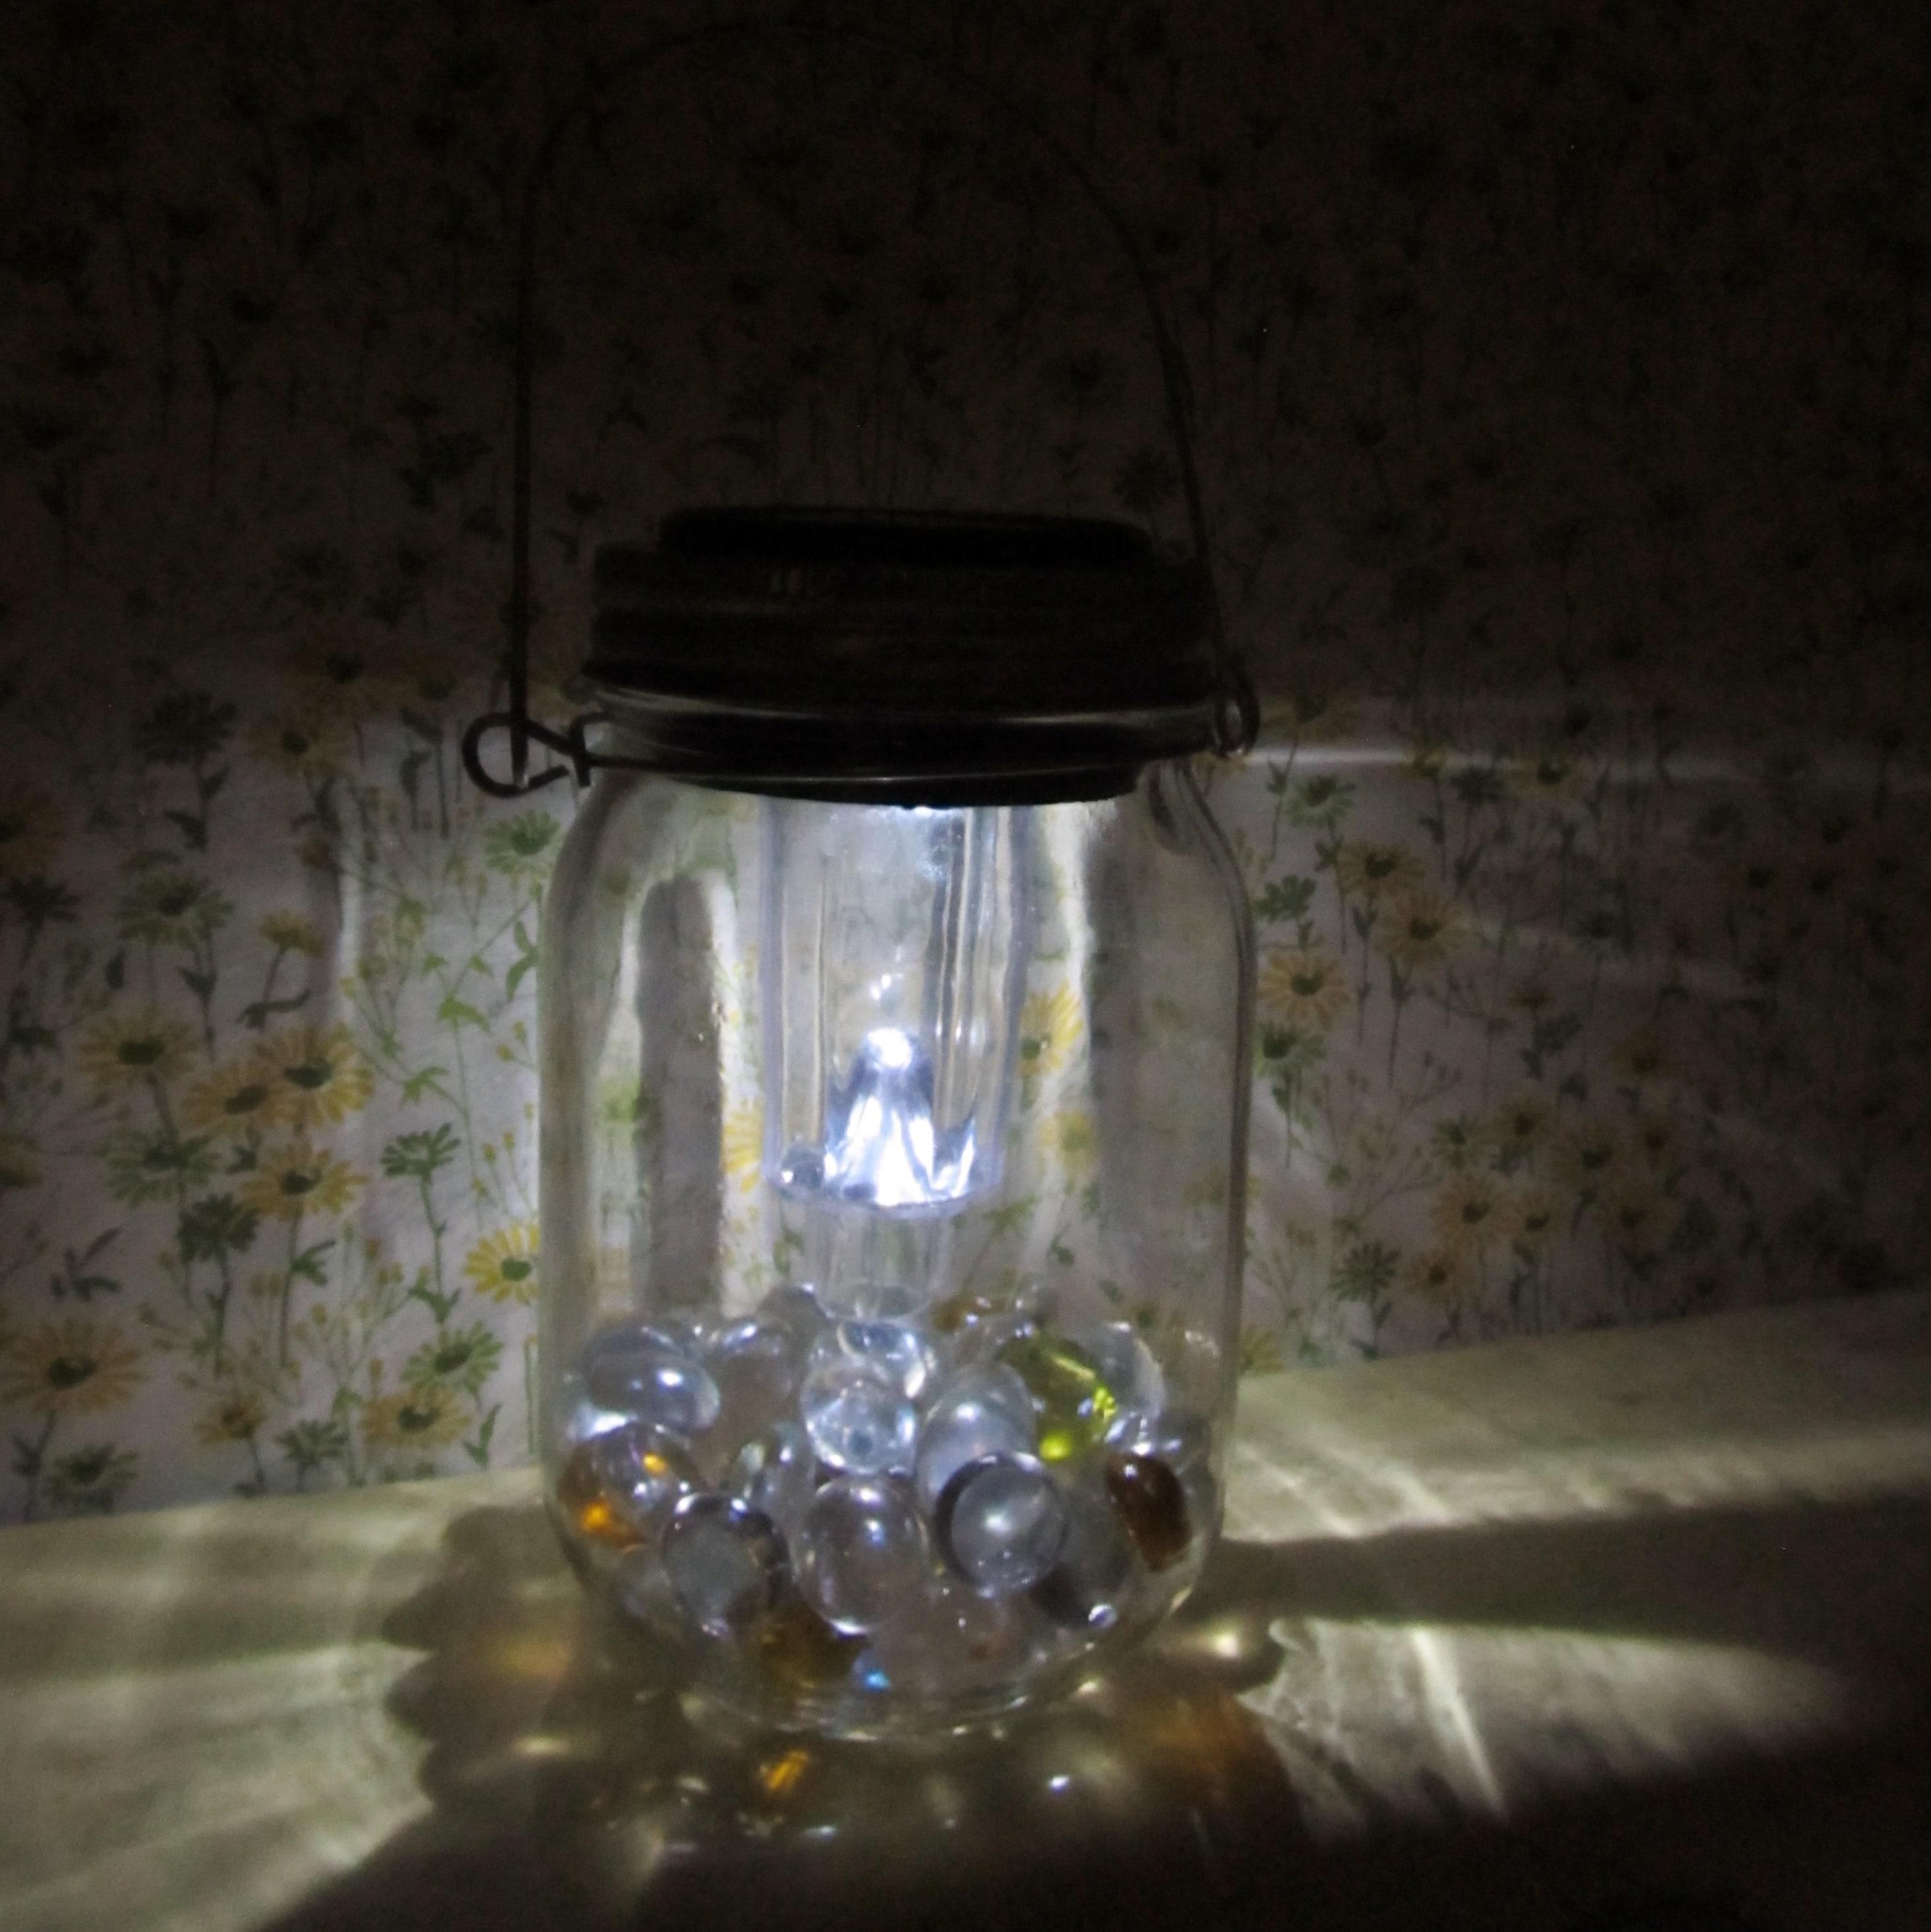 diy mason jar lighting sparkle mason jar lantern made with dollar tree supplies fun diy craft idea for the garden hanging solar lights craft idea